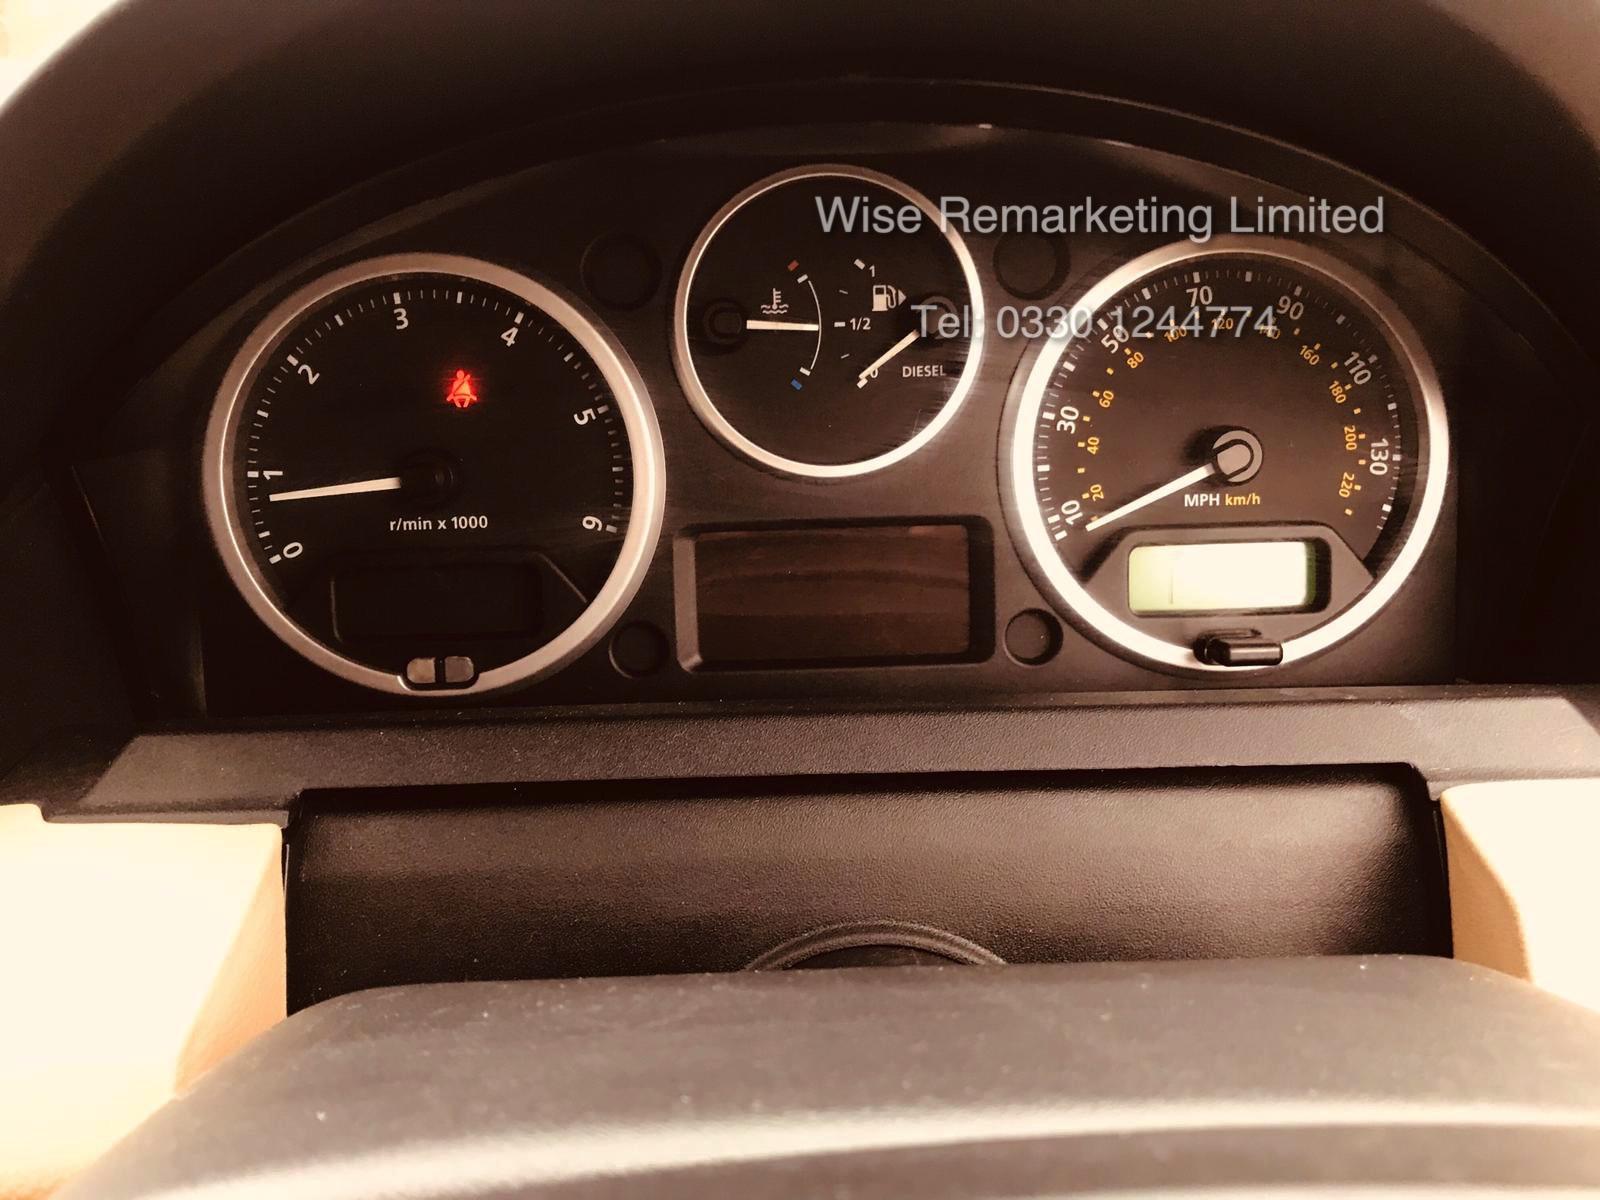 Range Rover Sport 2.7 TDV6 HSE Auto - 2008 Model - Cream Leather - Sat Nav - Heated Seats - Image 19 of 19